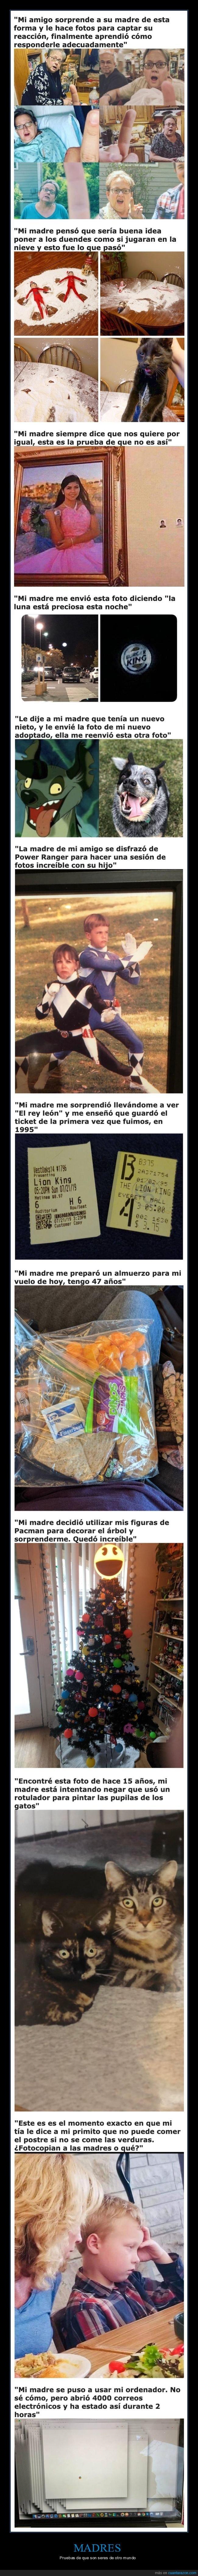 bolsa de chuches naranja y negra helices naranjas